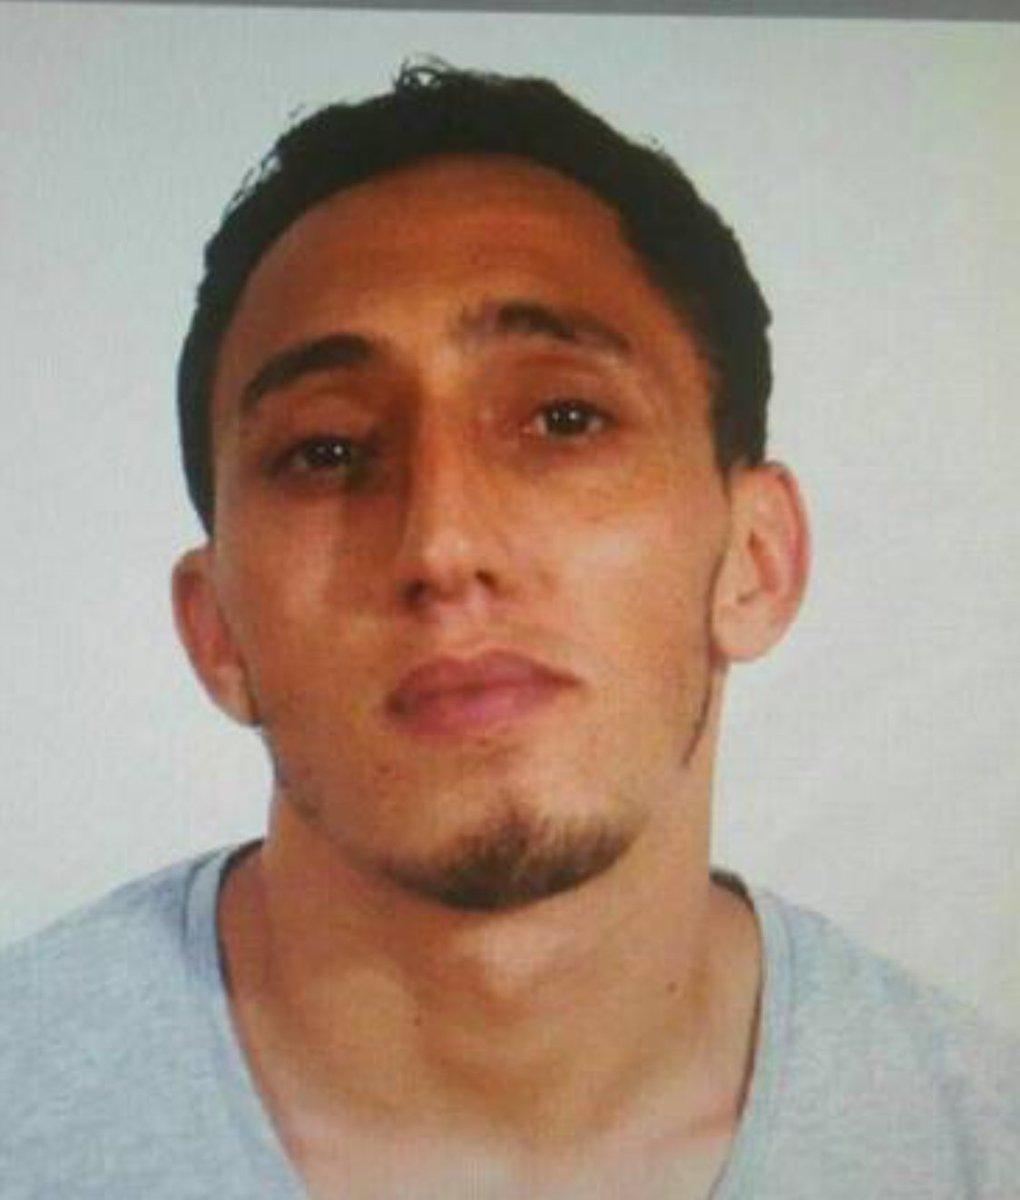 Driss Oukabir one of Barcelona terrorist